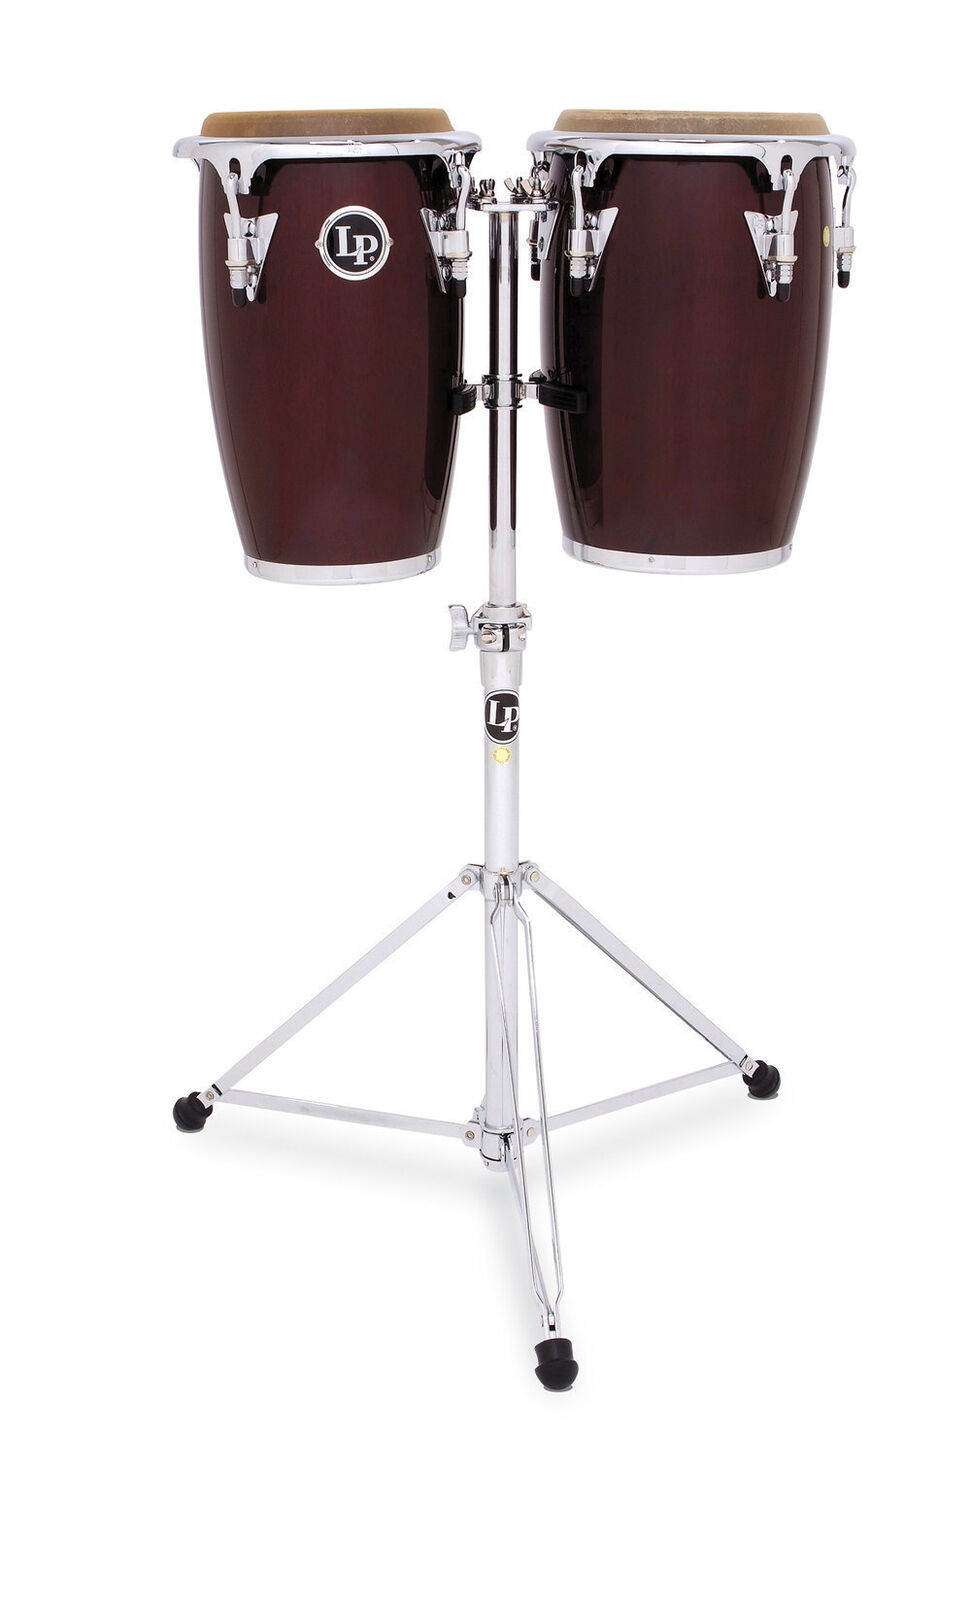 Latin Percussion Congaset Jr. Congas  Latin Percussion